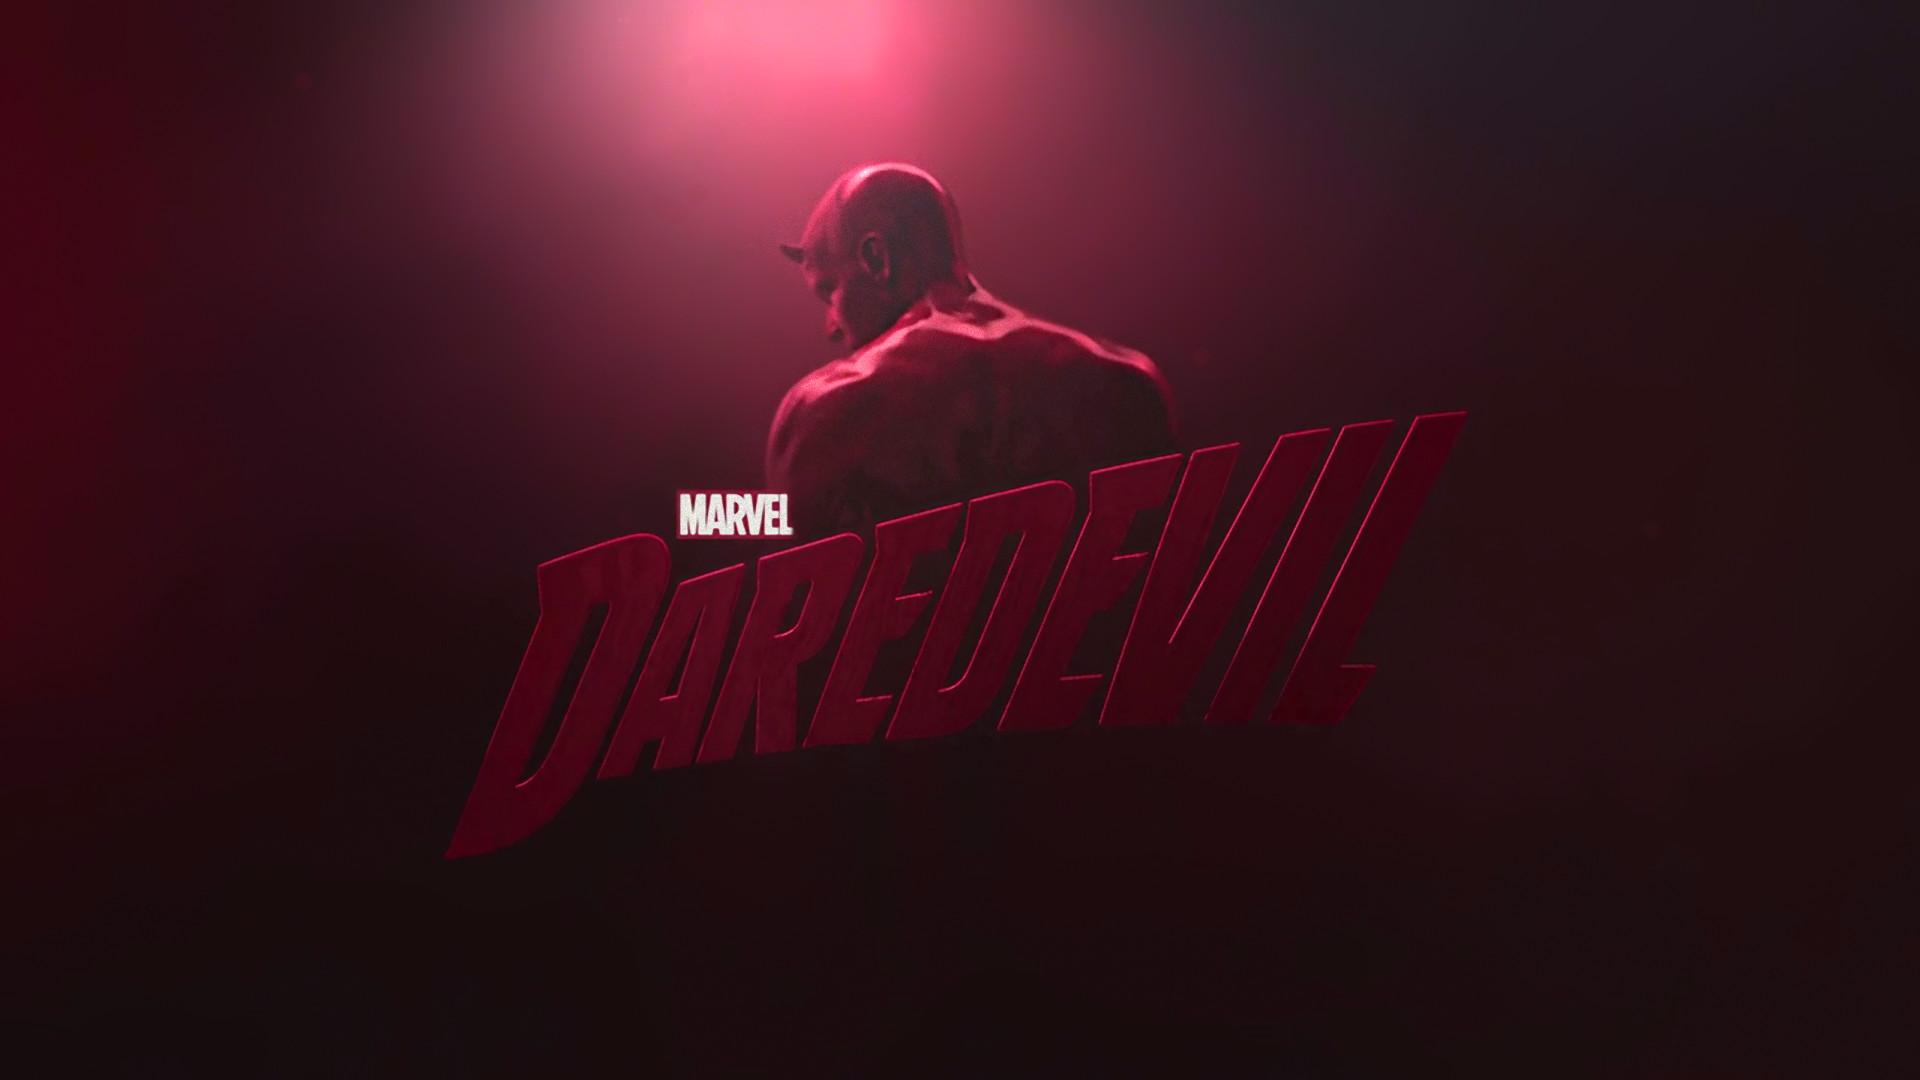 Daredevil Ben Affleck Wallpaper